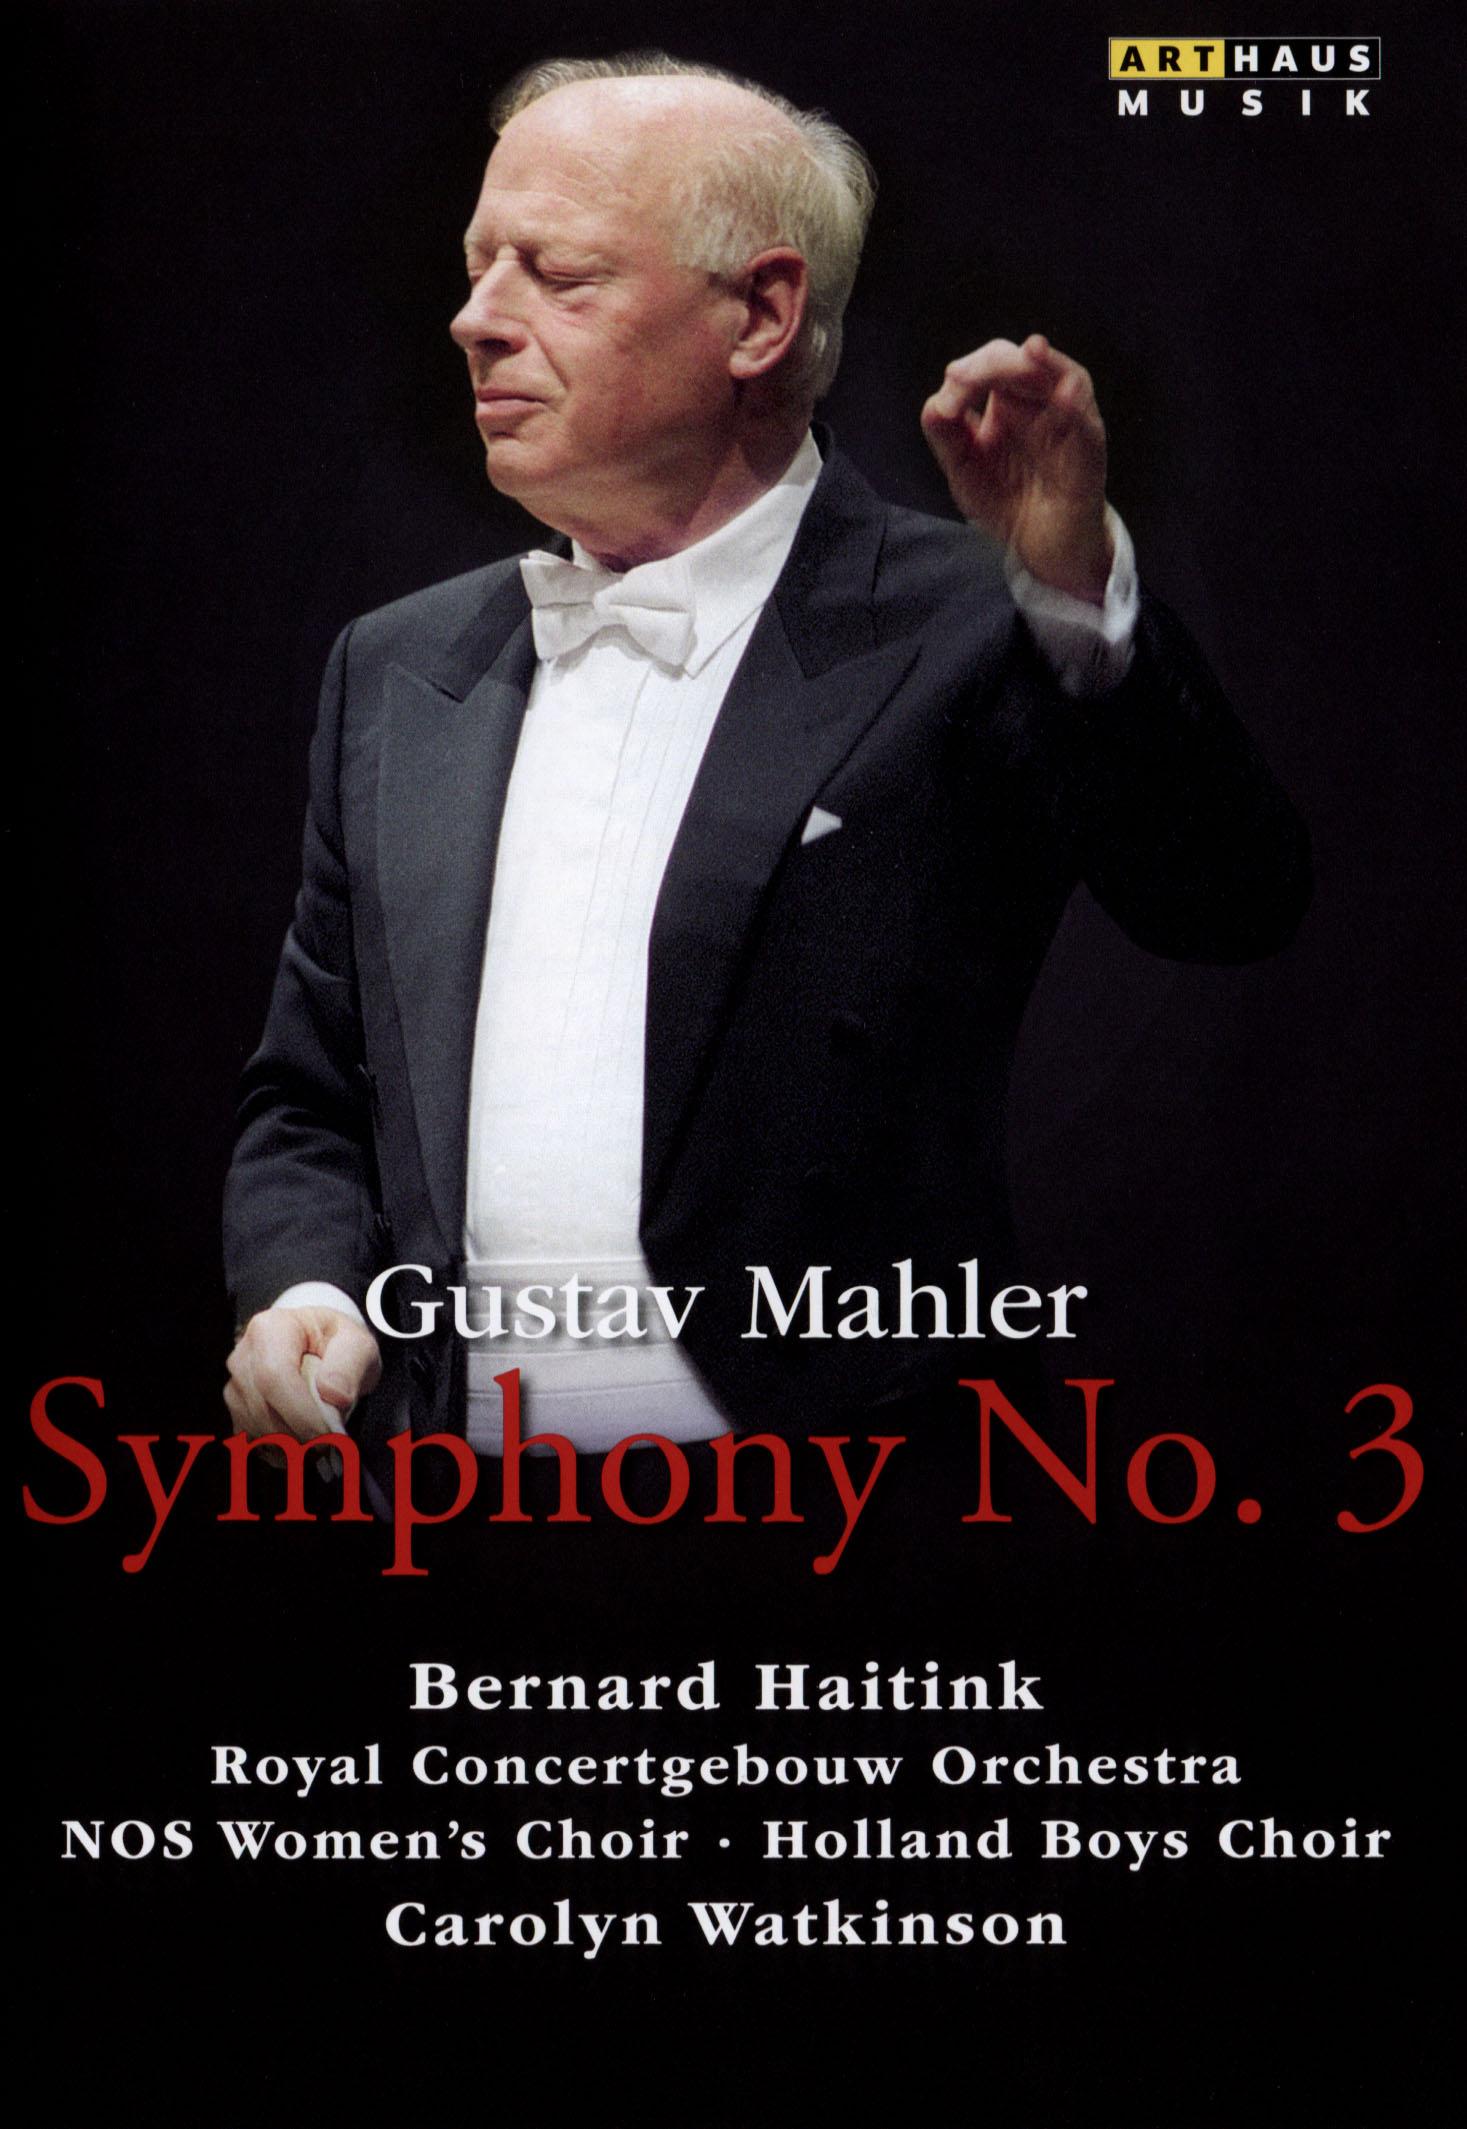 Bernard Haitink/Royal Concertgebouw Orchestra: Gustav Mahler - Symphony No. 3